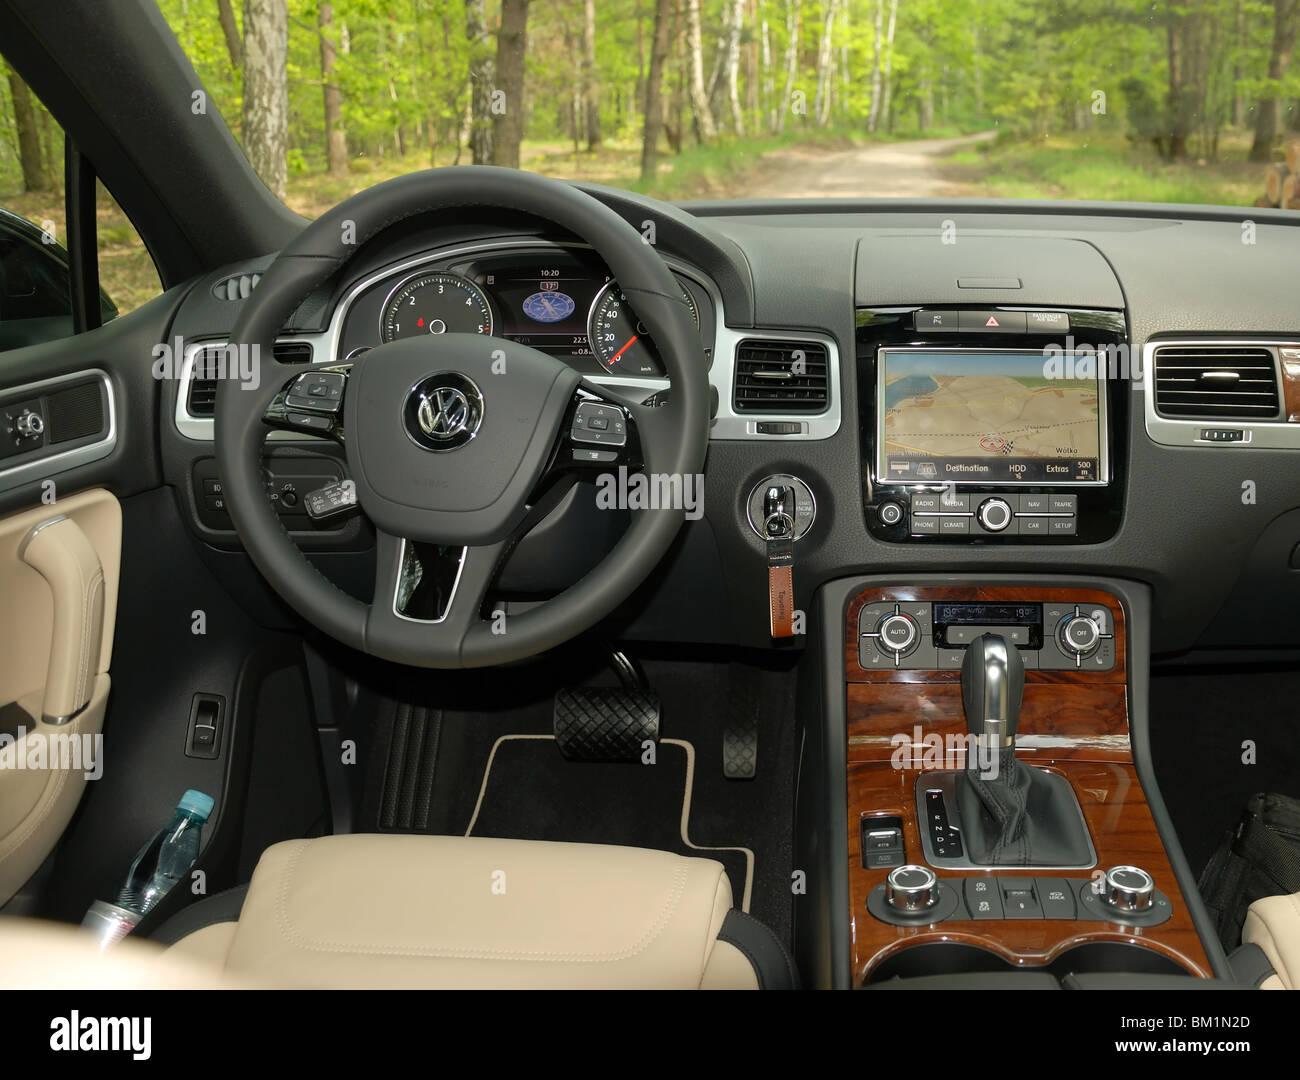 Volkswagen Touareg 3.0 TDI V6 BlueMotion - mein 2010 (MK2 ...